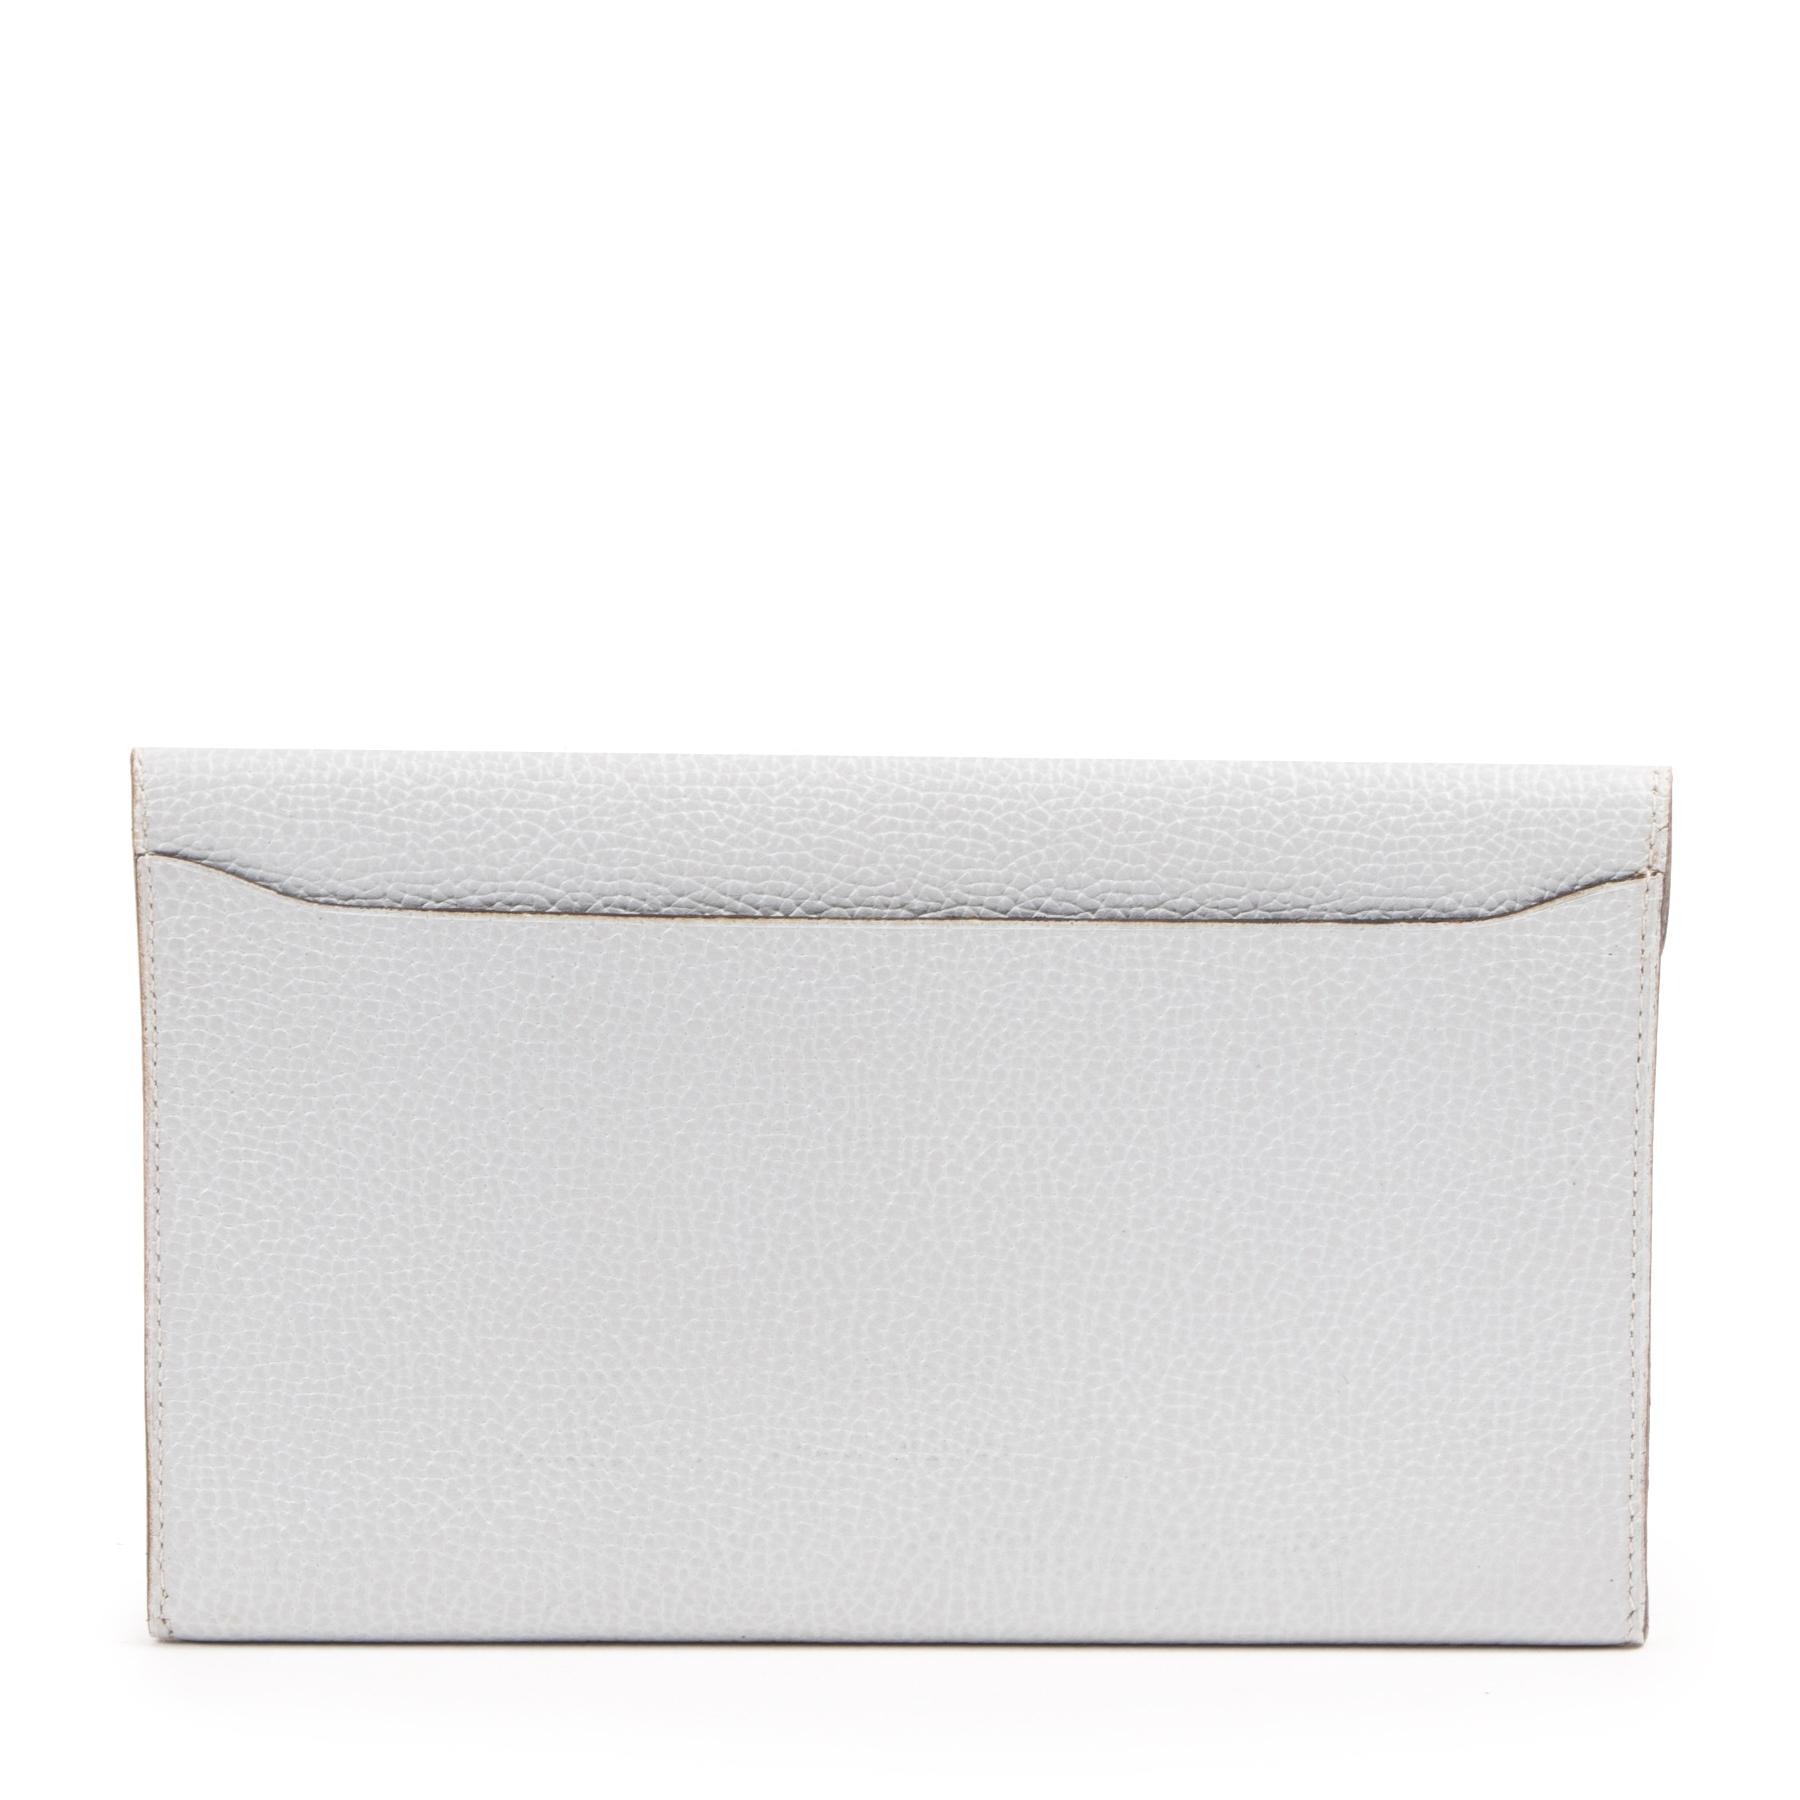 Delvaux Light Blue Leather Wallet